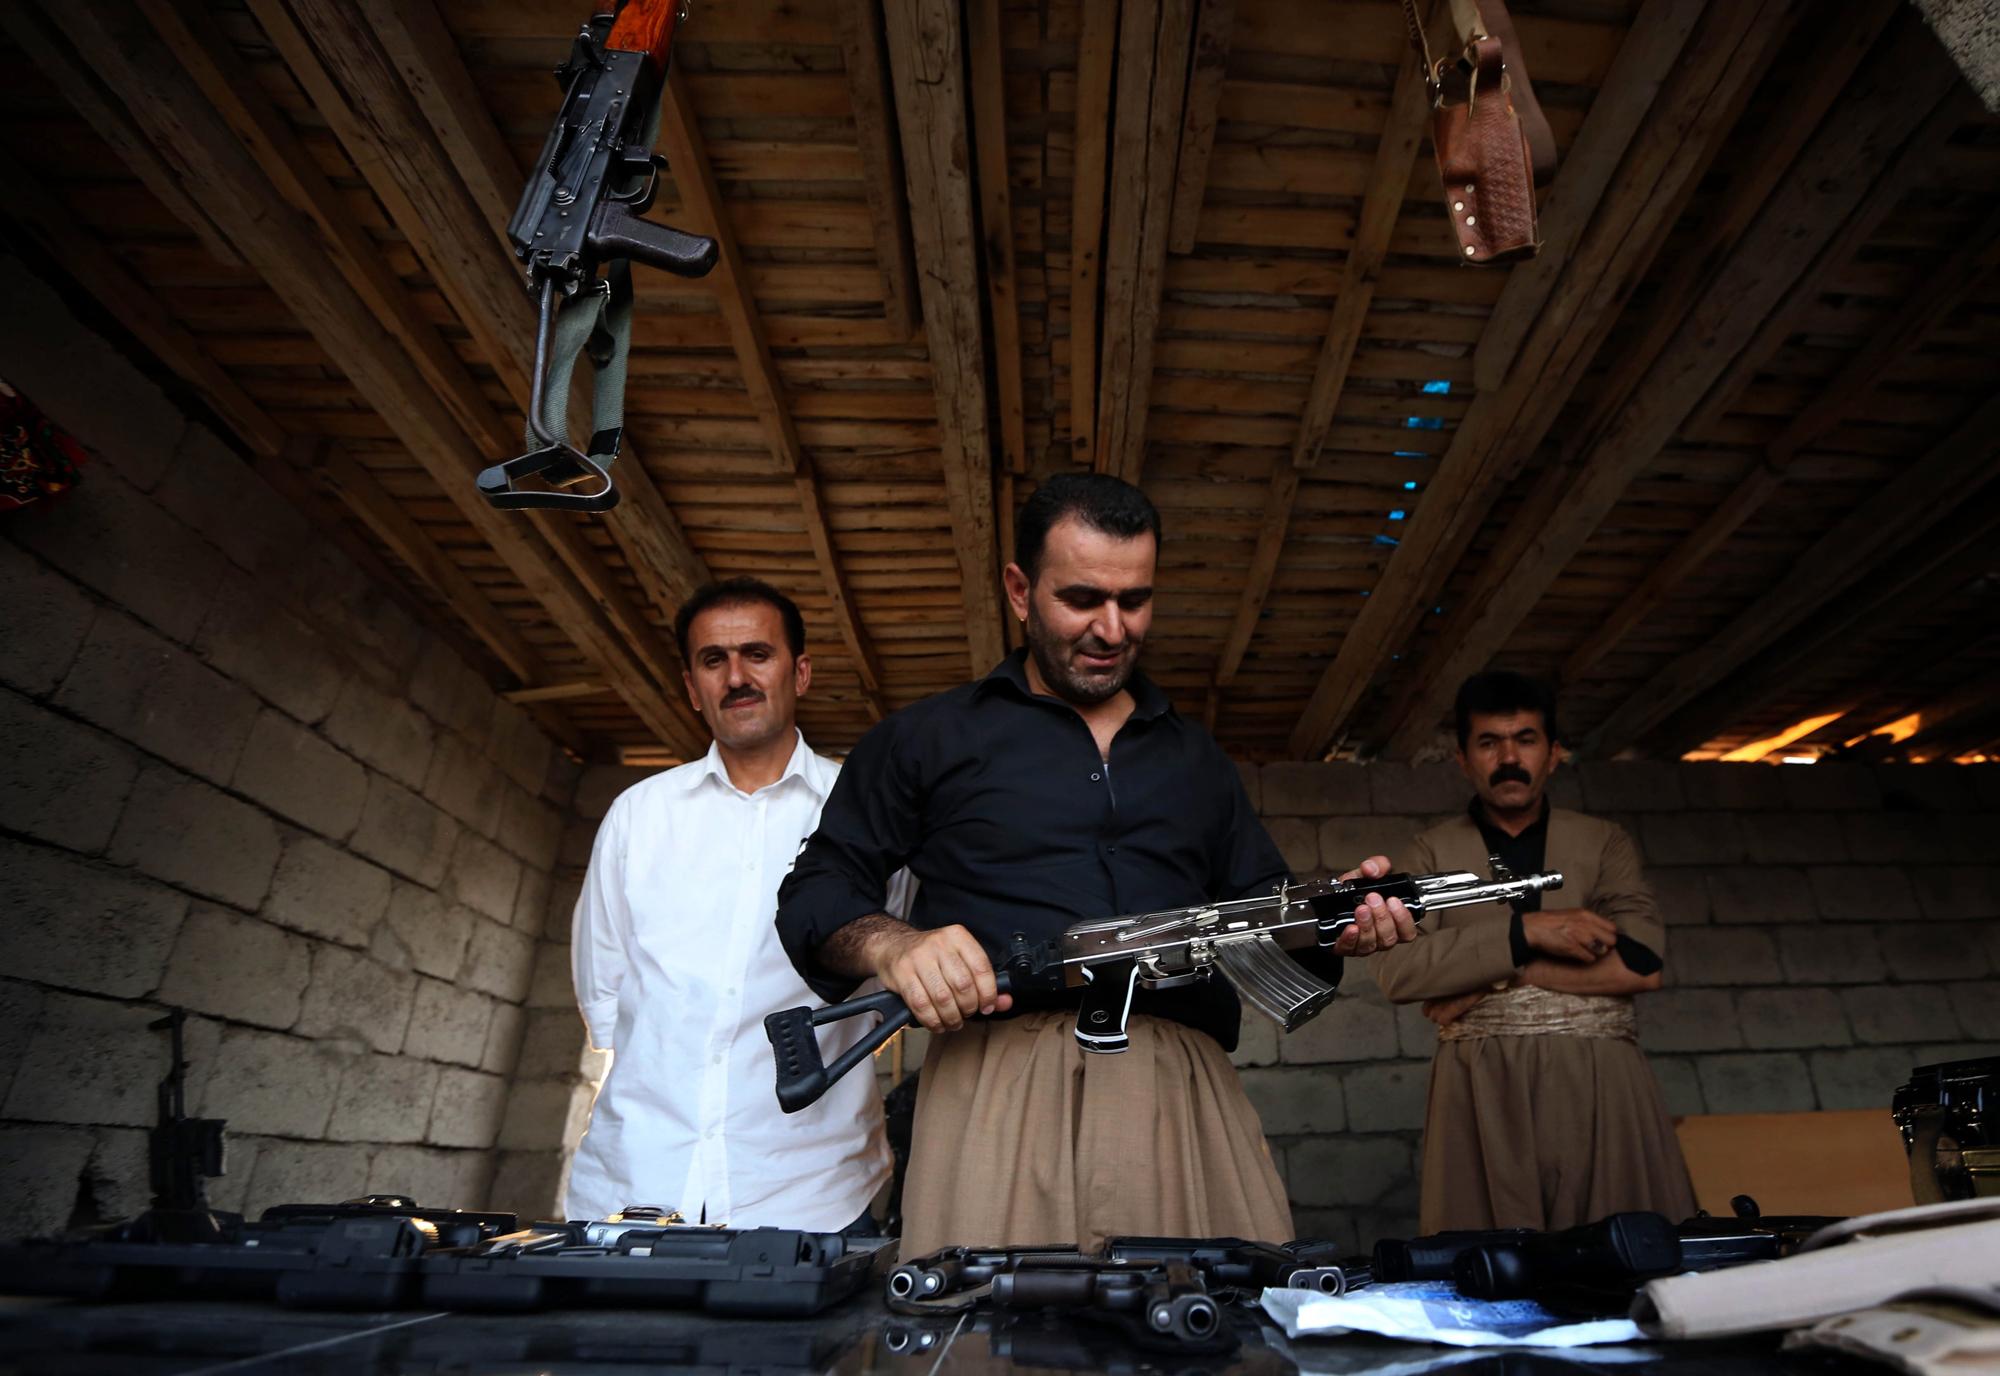 An Iraqi Kurd inspects a machine gun at an arms market in Erbil, the capital of the autonomous Kurdish region of northern Iraq on Aug. 17, 2014.